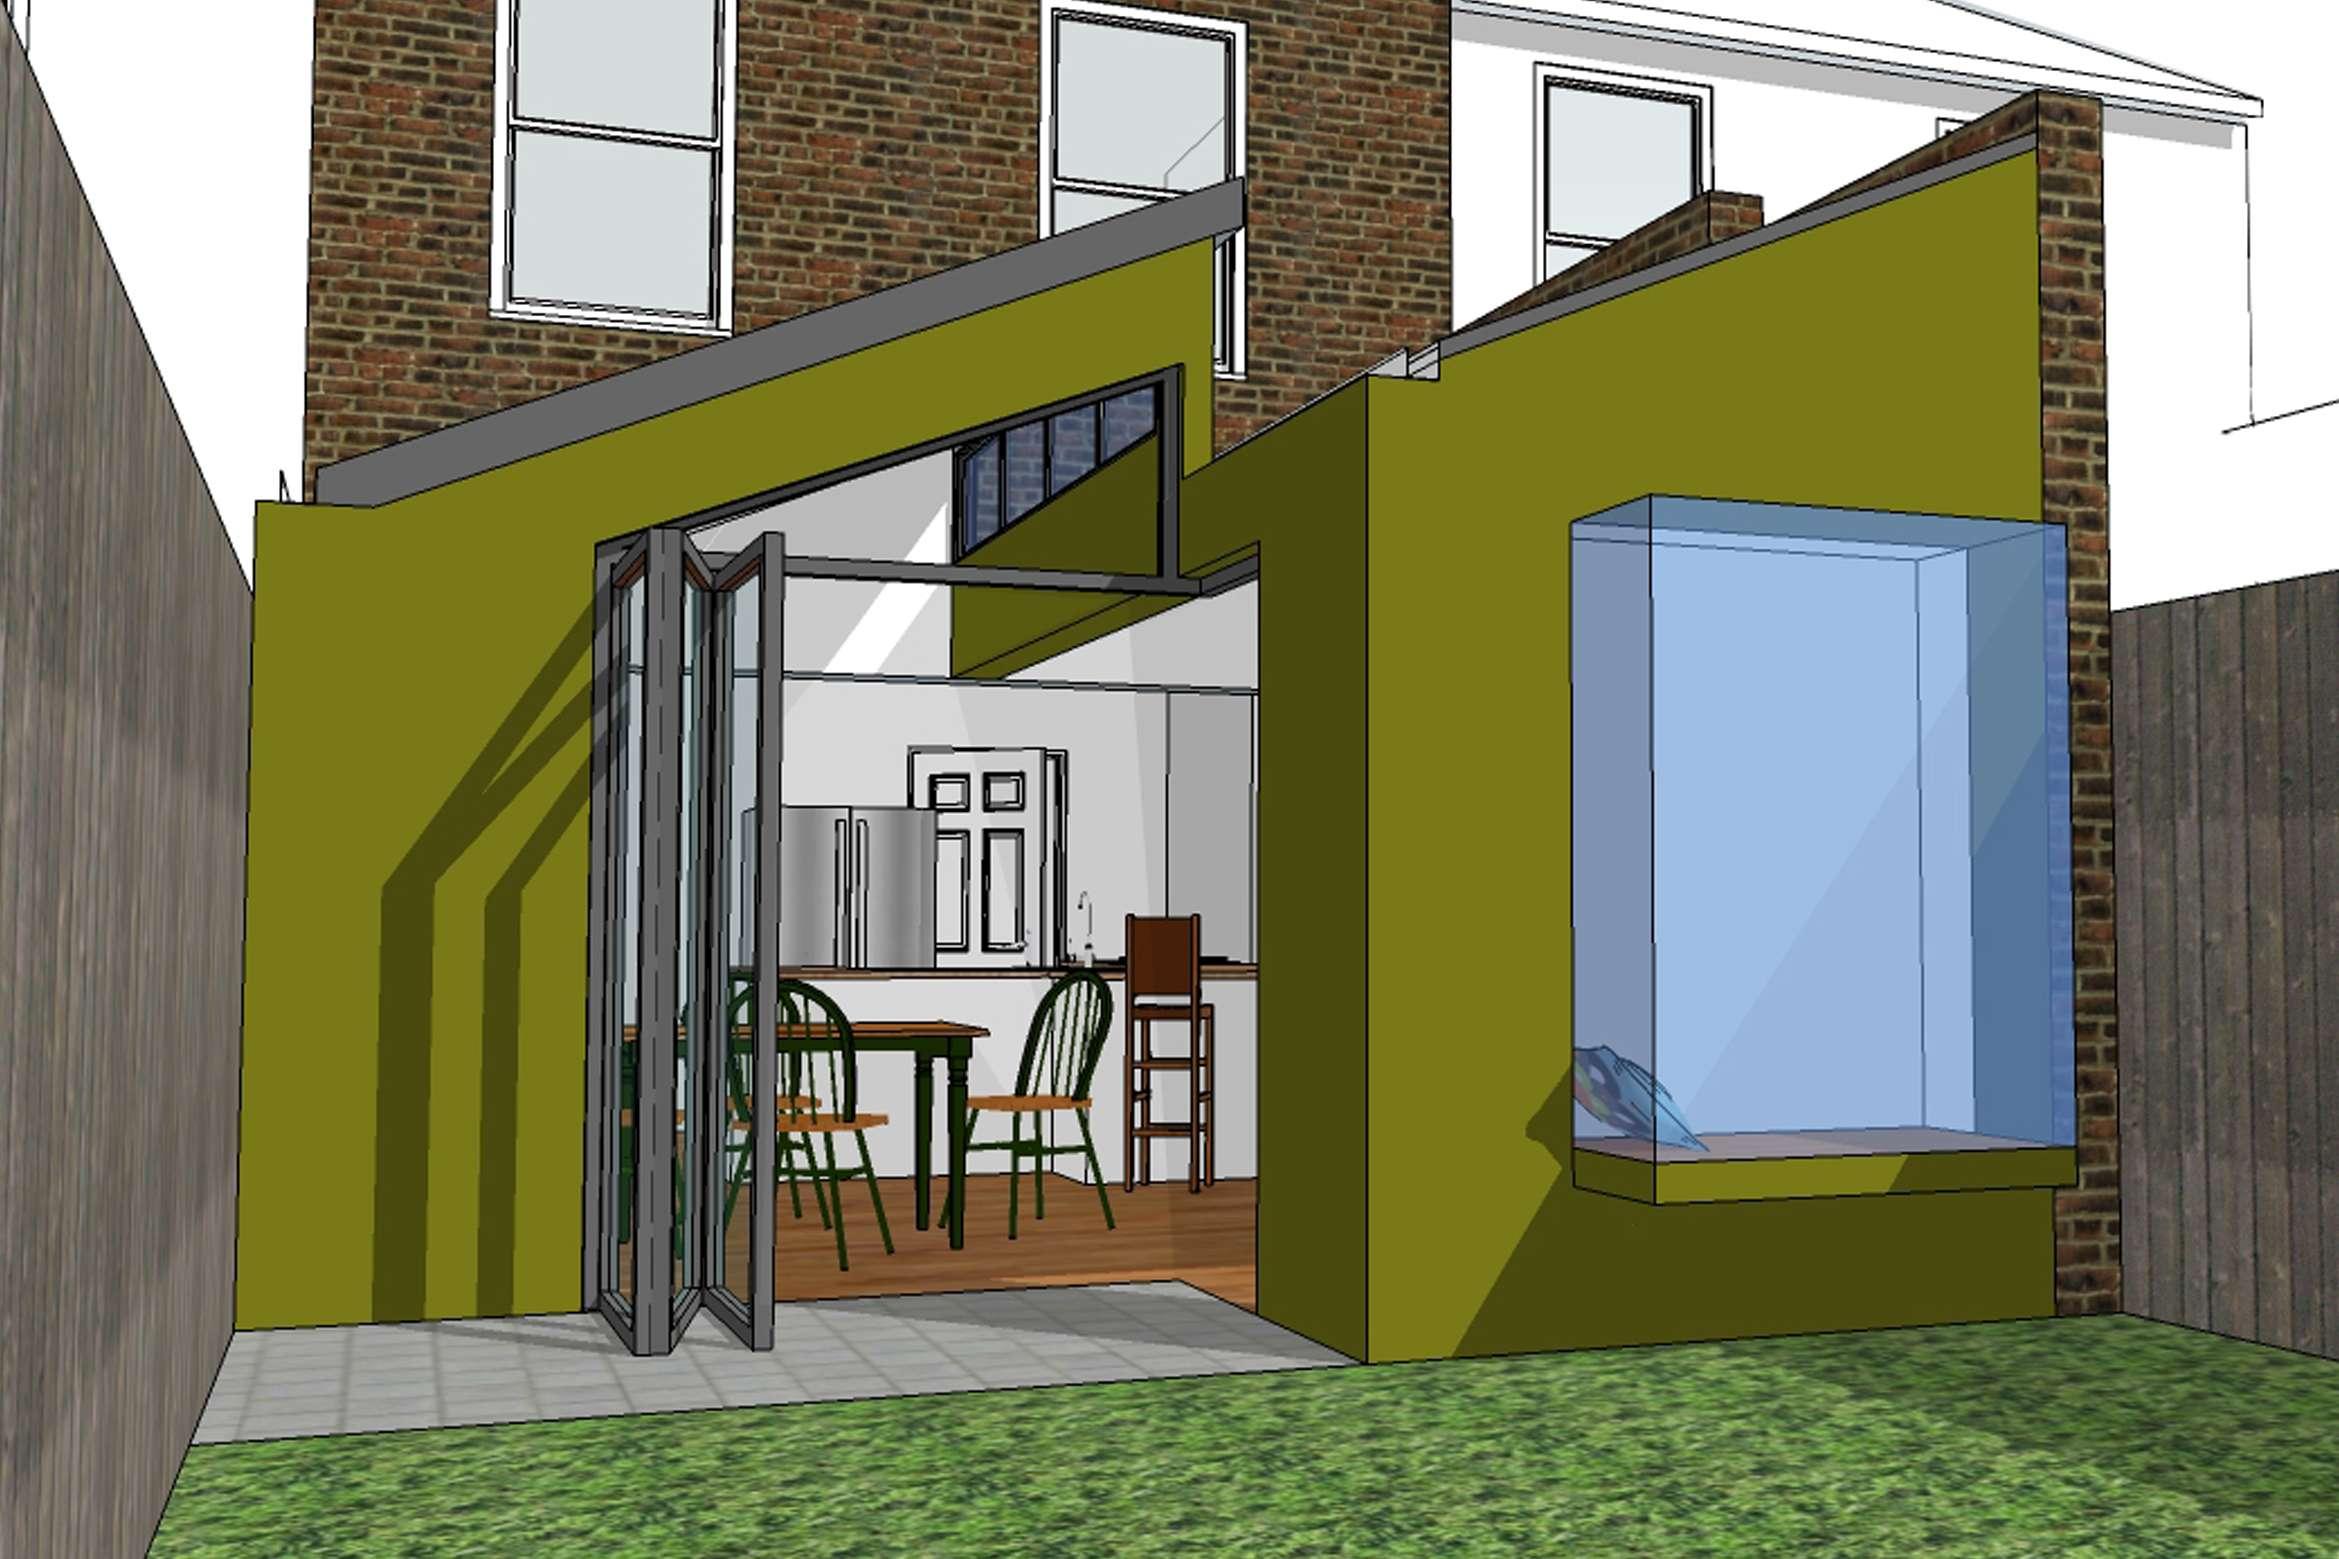 Barnes Richmond SW14 – Rear house kitchen extension – 3D image Barnes, Richmond SW14 | Rear house kitchen extension